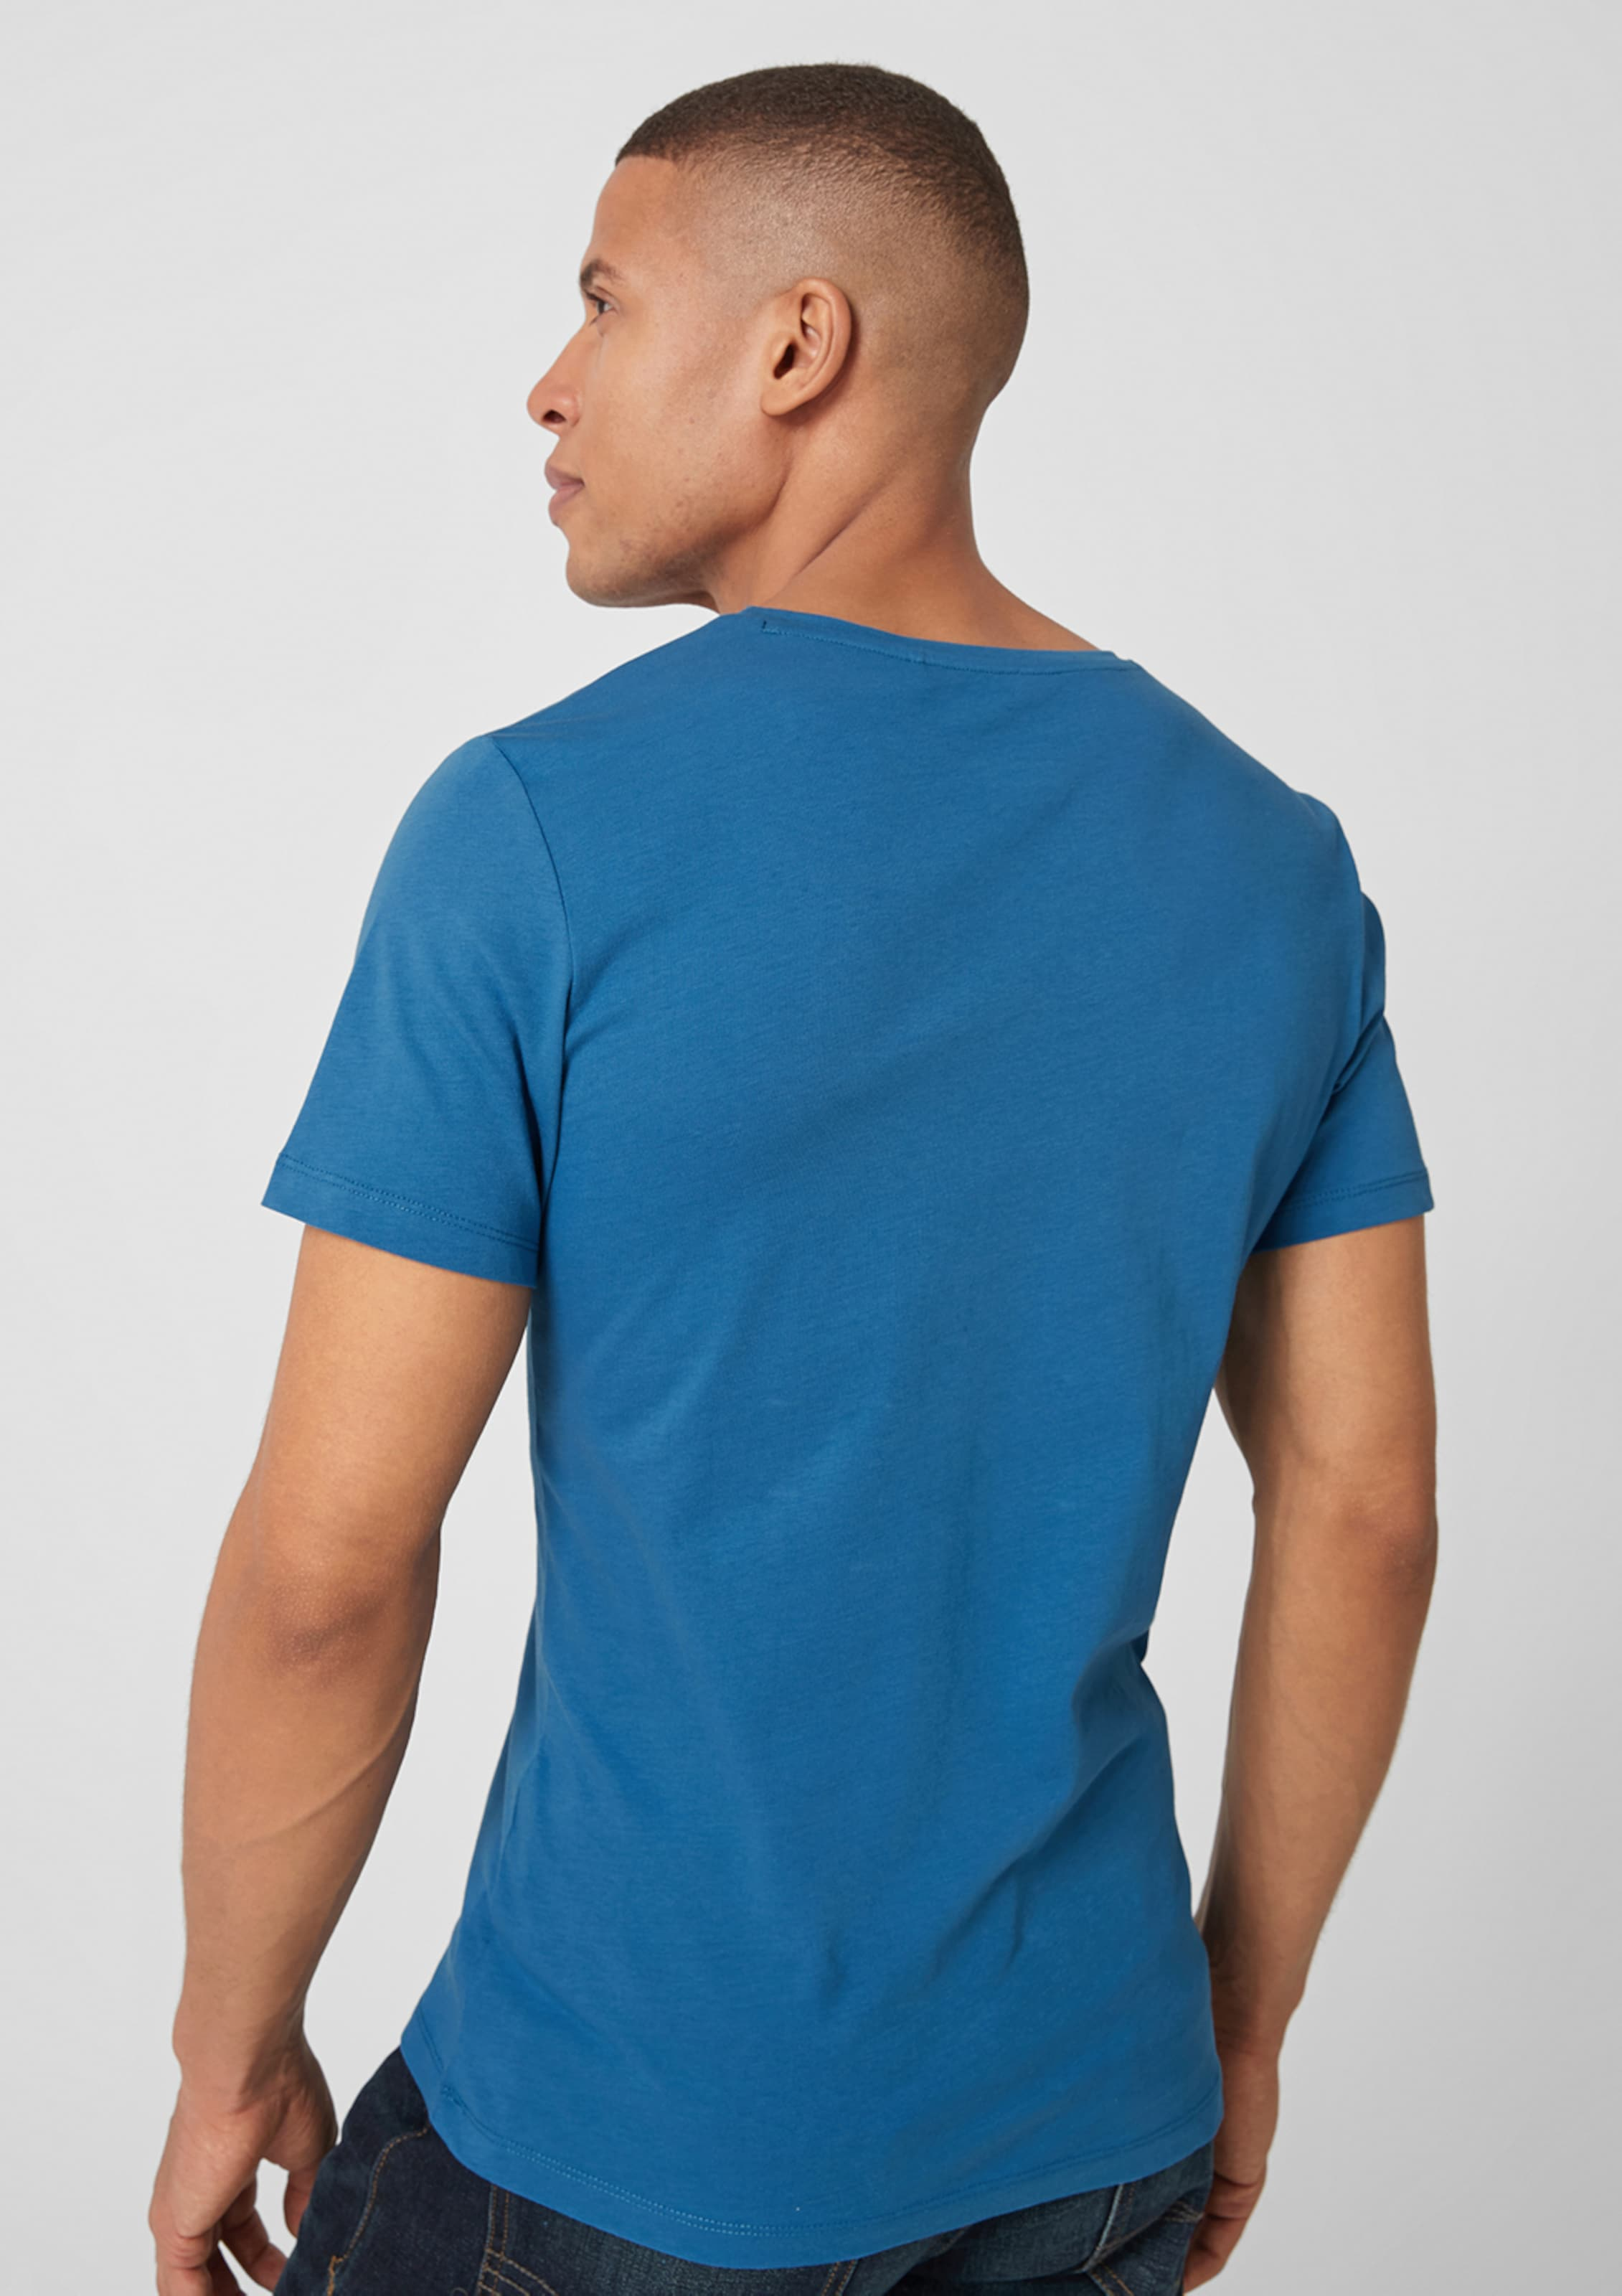 oliver In shirt T Blau S VMzpqSU